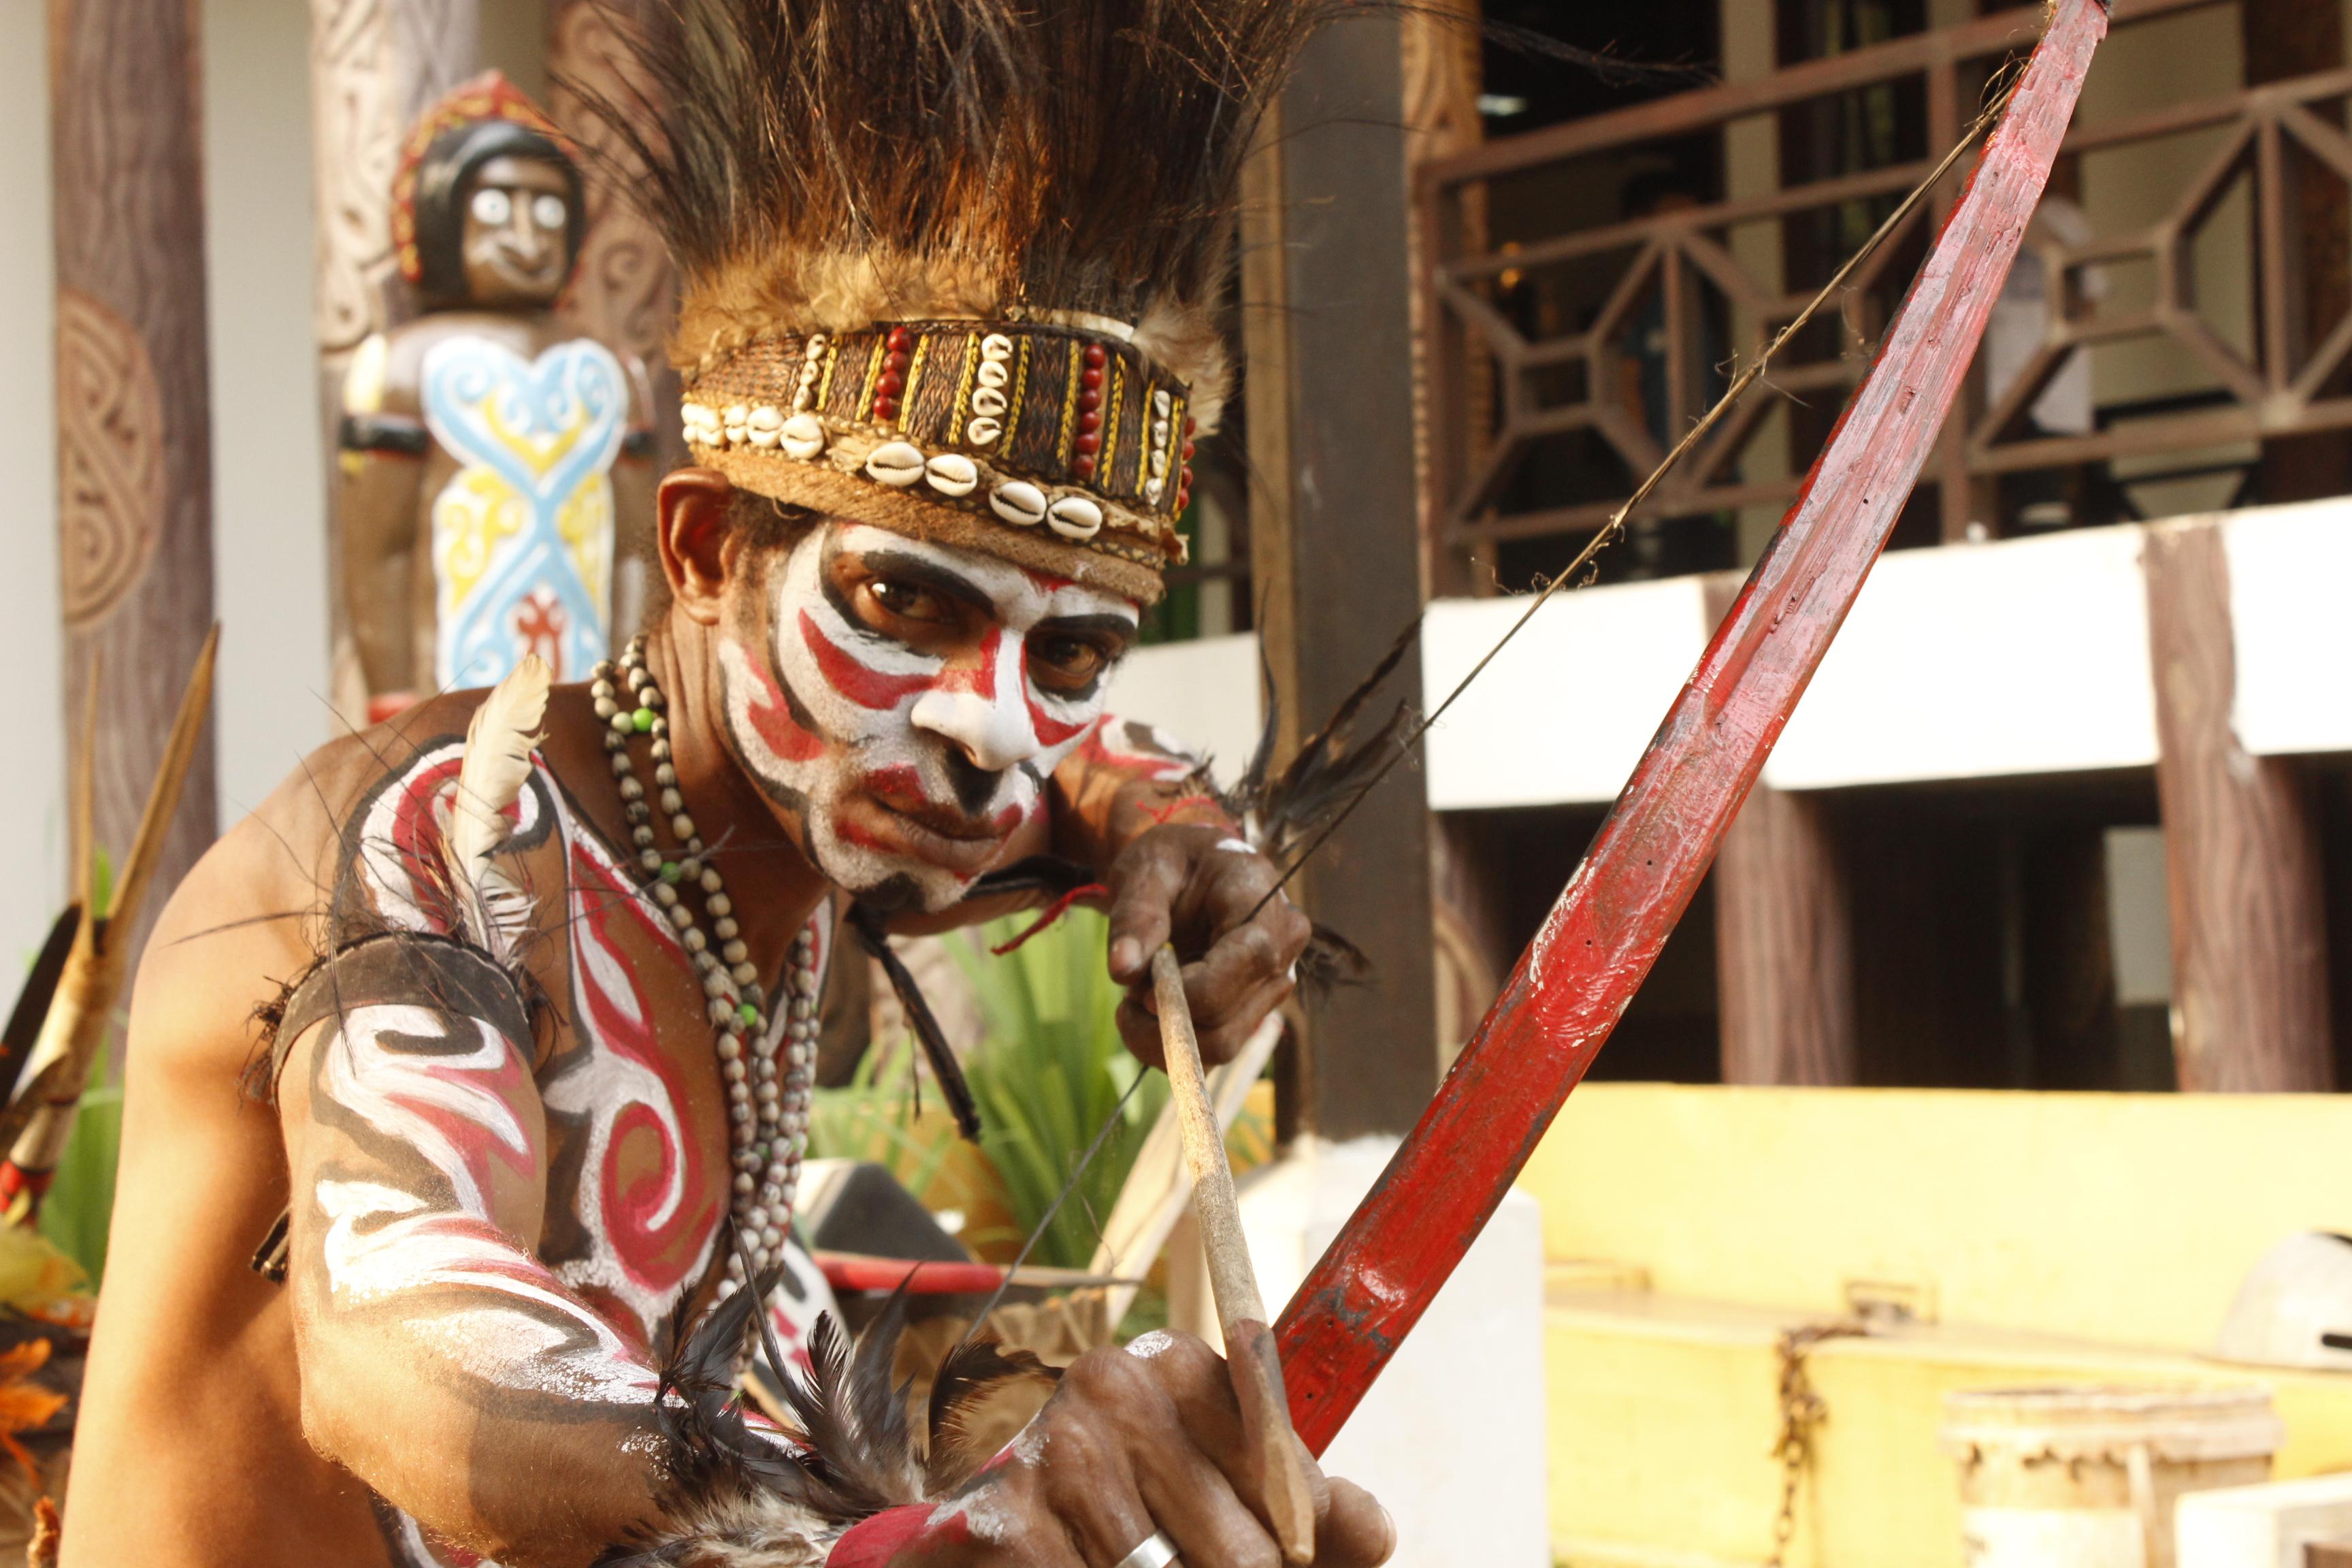 Pakaian Adat Untuk Menutupi Kemaluan Di Papua